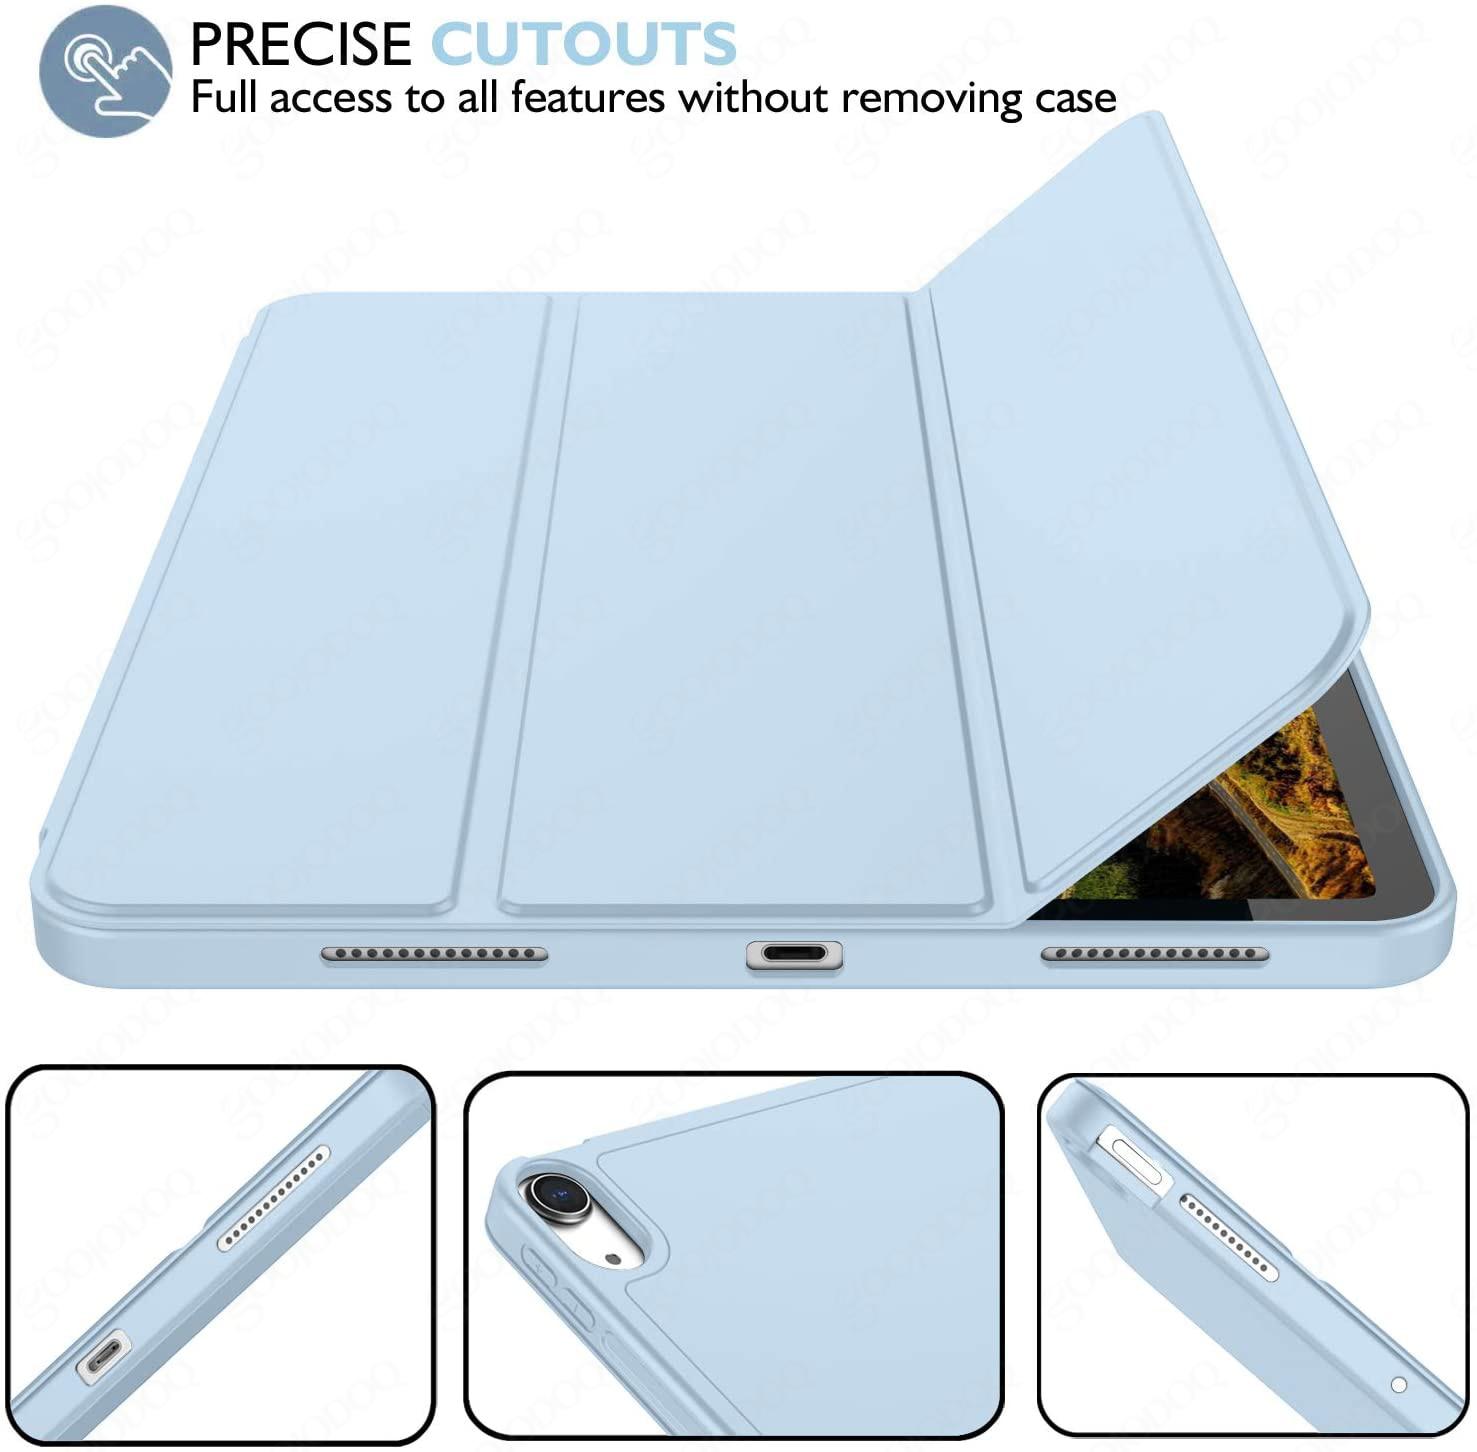 حافظة لجهاز iPad Air 4 iPad Pro 11 2020 2021 حافظة لجهاز iPad 8th من الجيل فوندا 8 6th 7th الجيل 10.2 Air 2020 Air 3 Mini Case